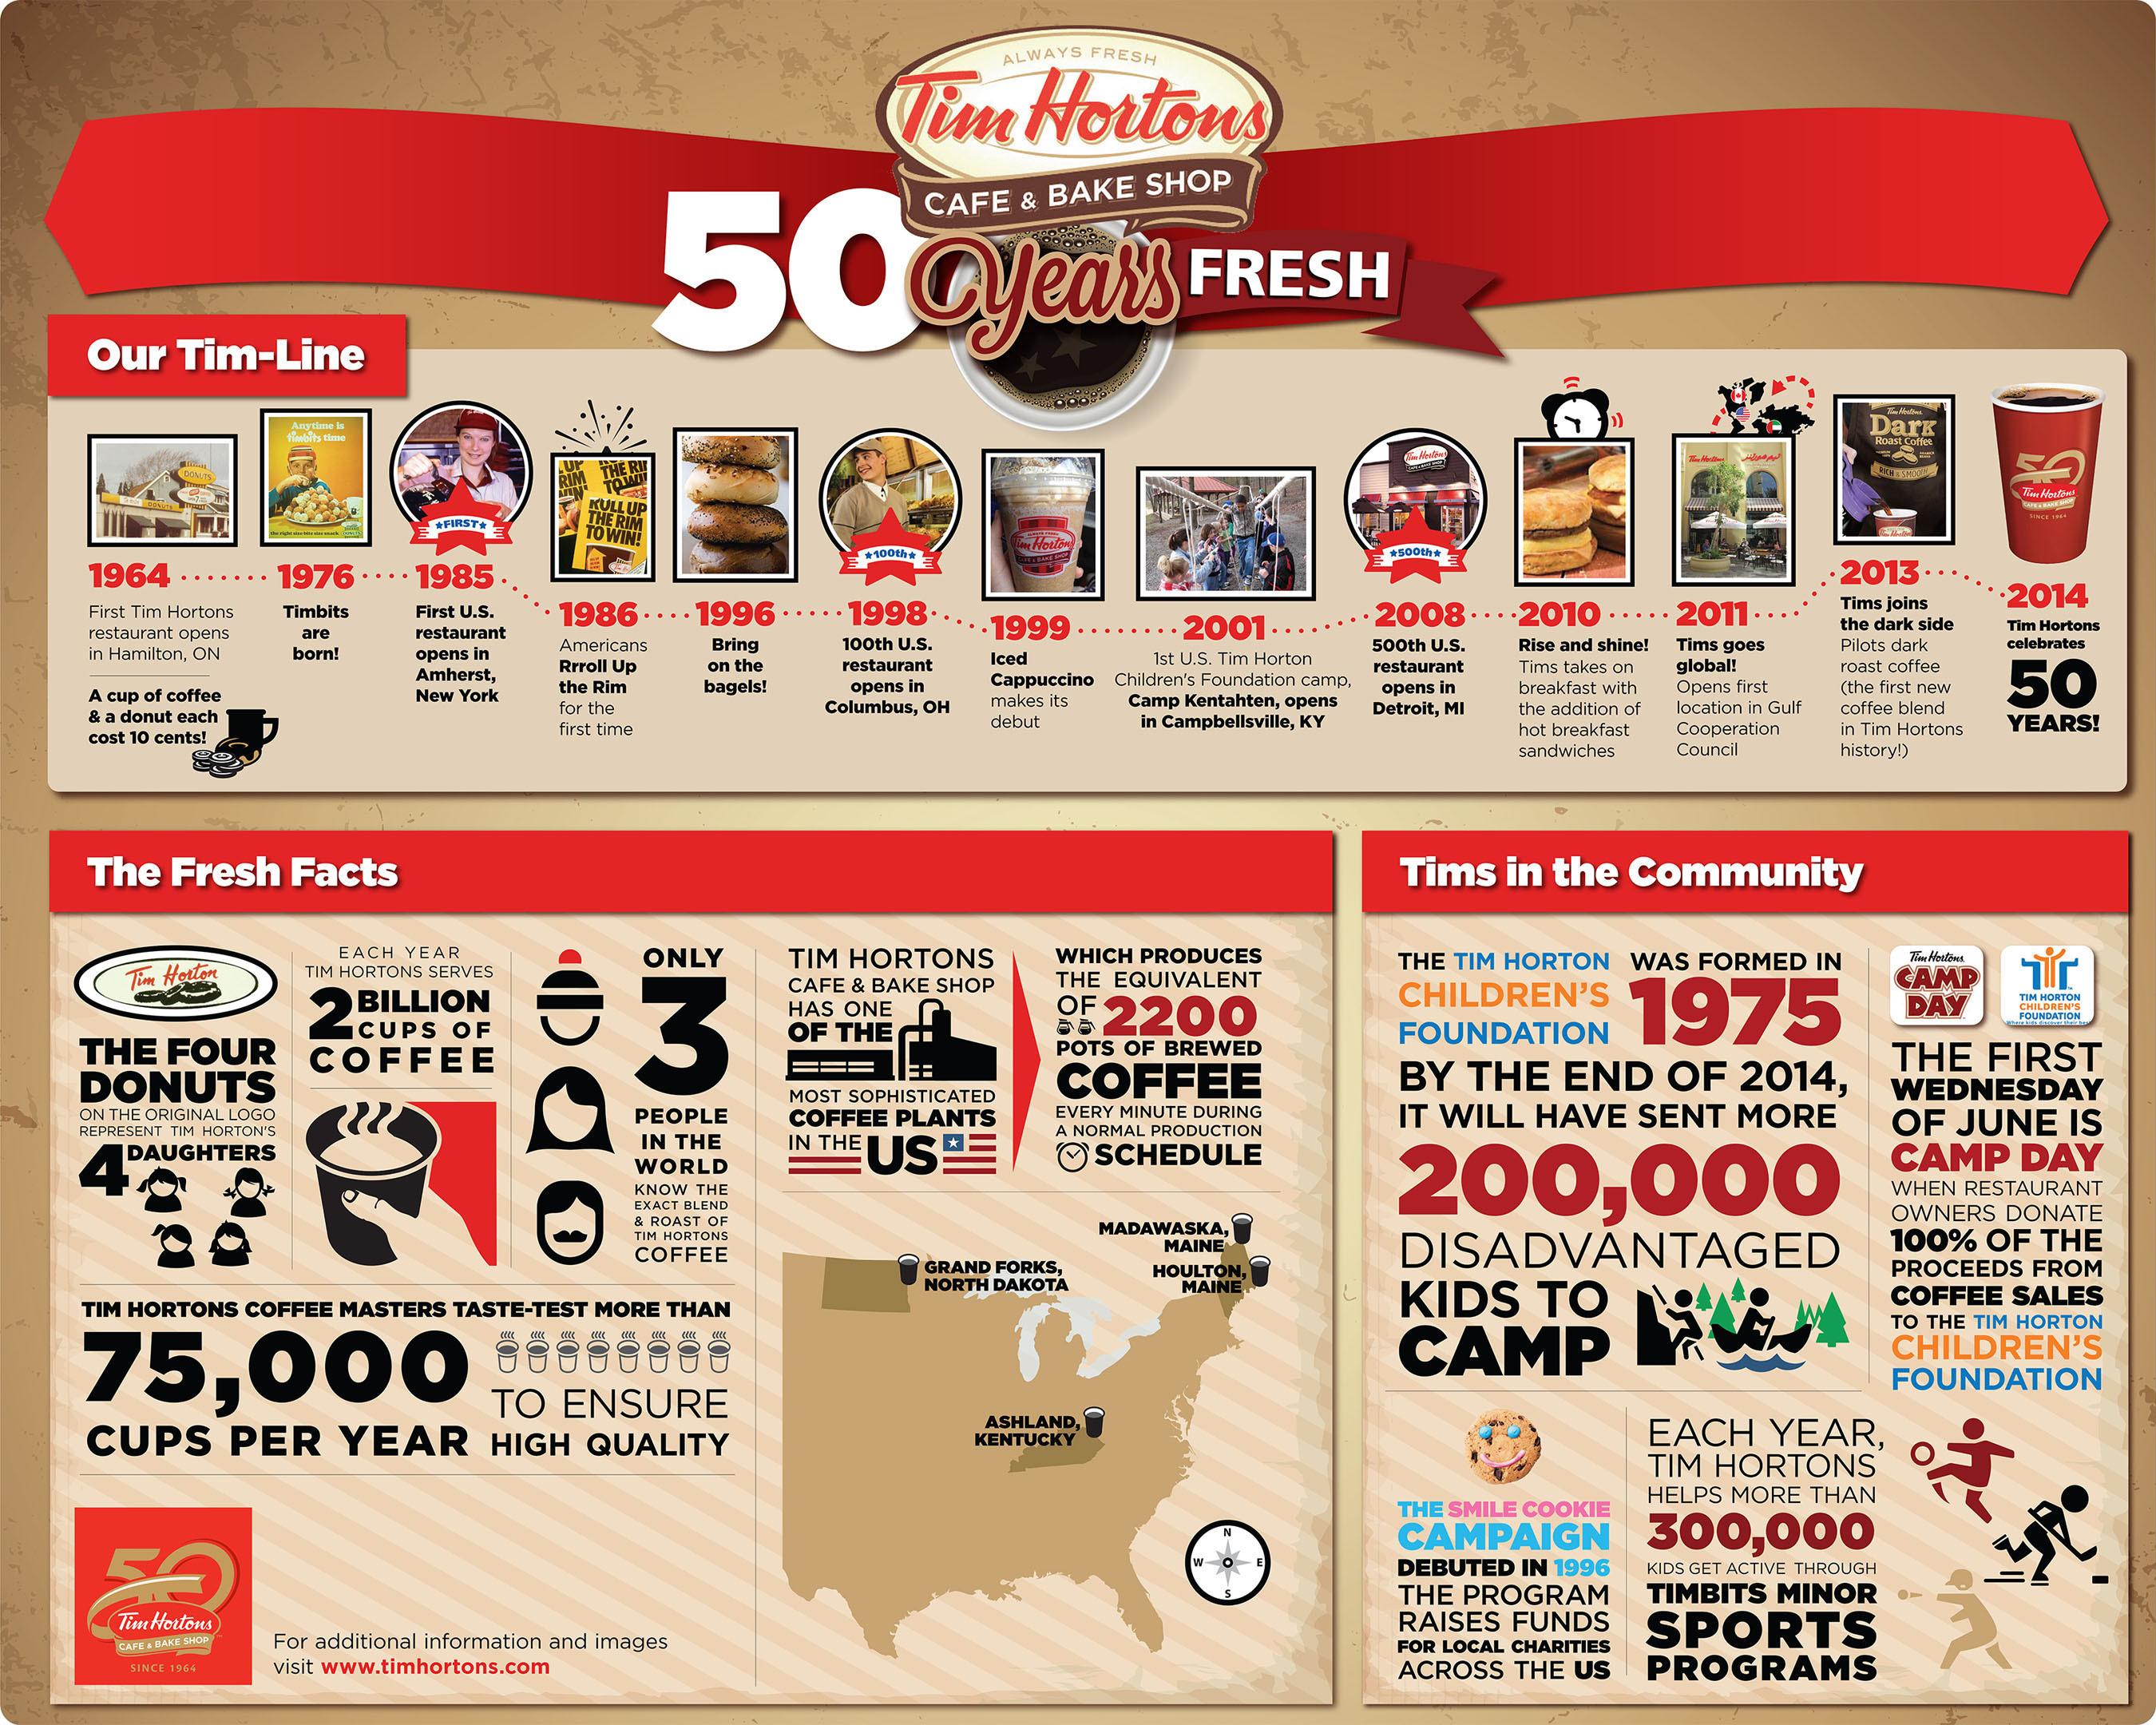 Tim Hortons celebrates 50-years fresh